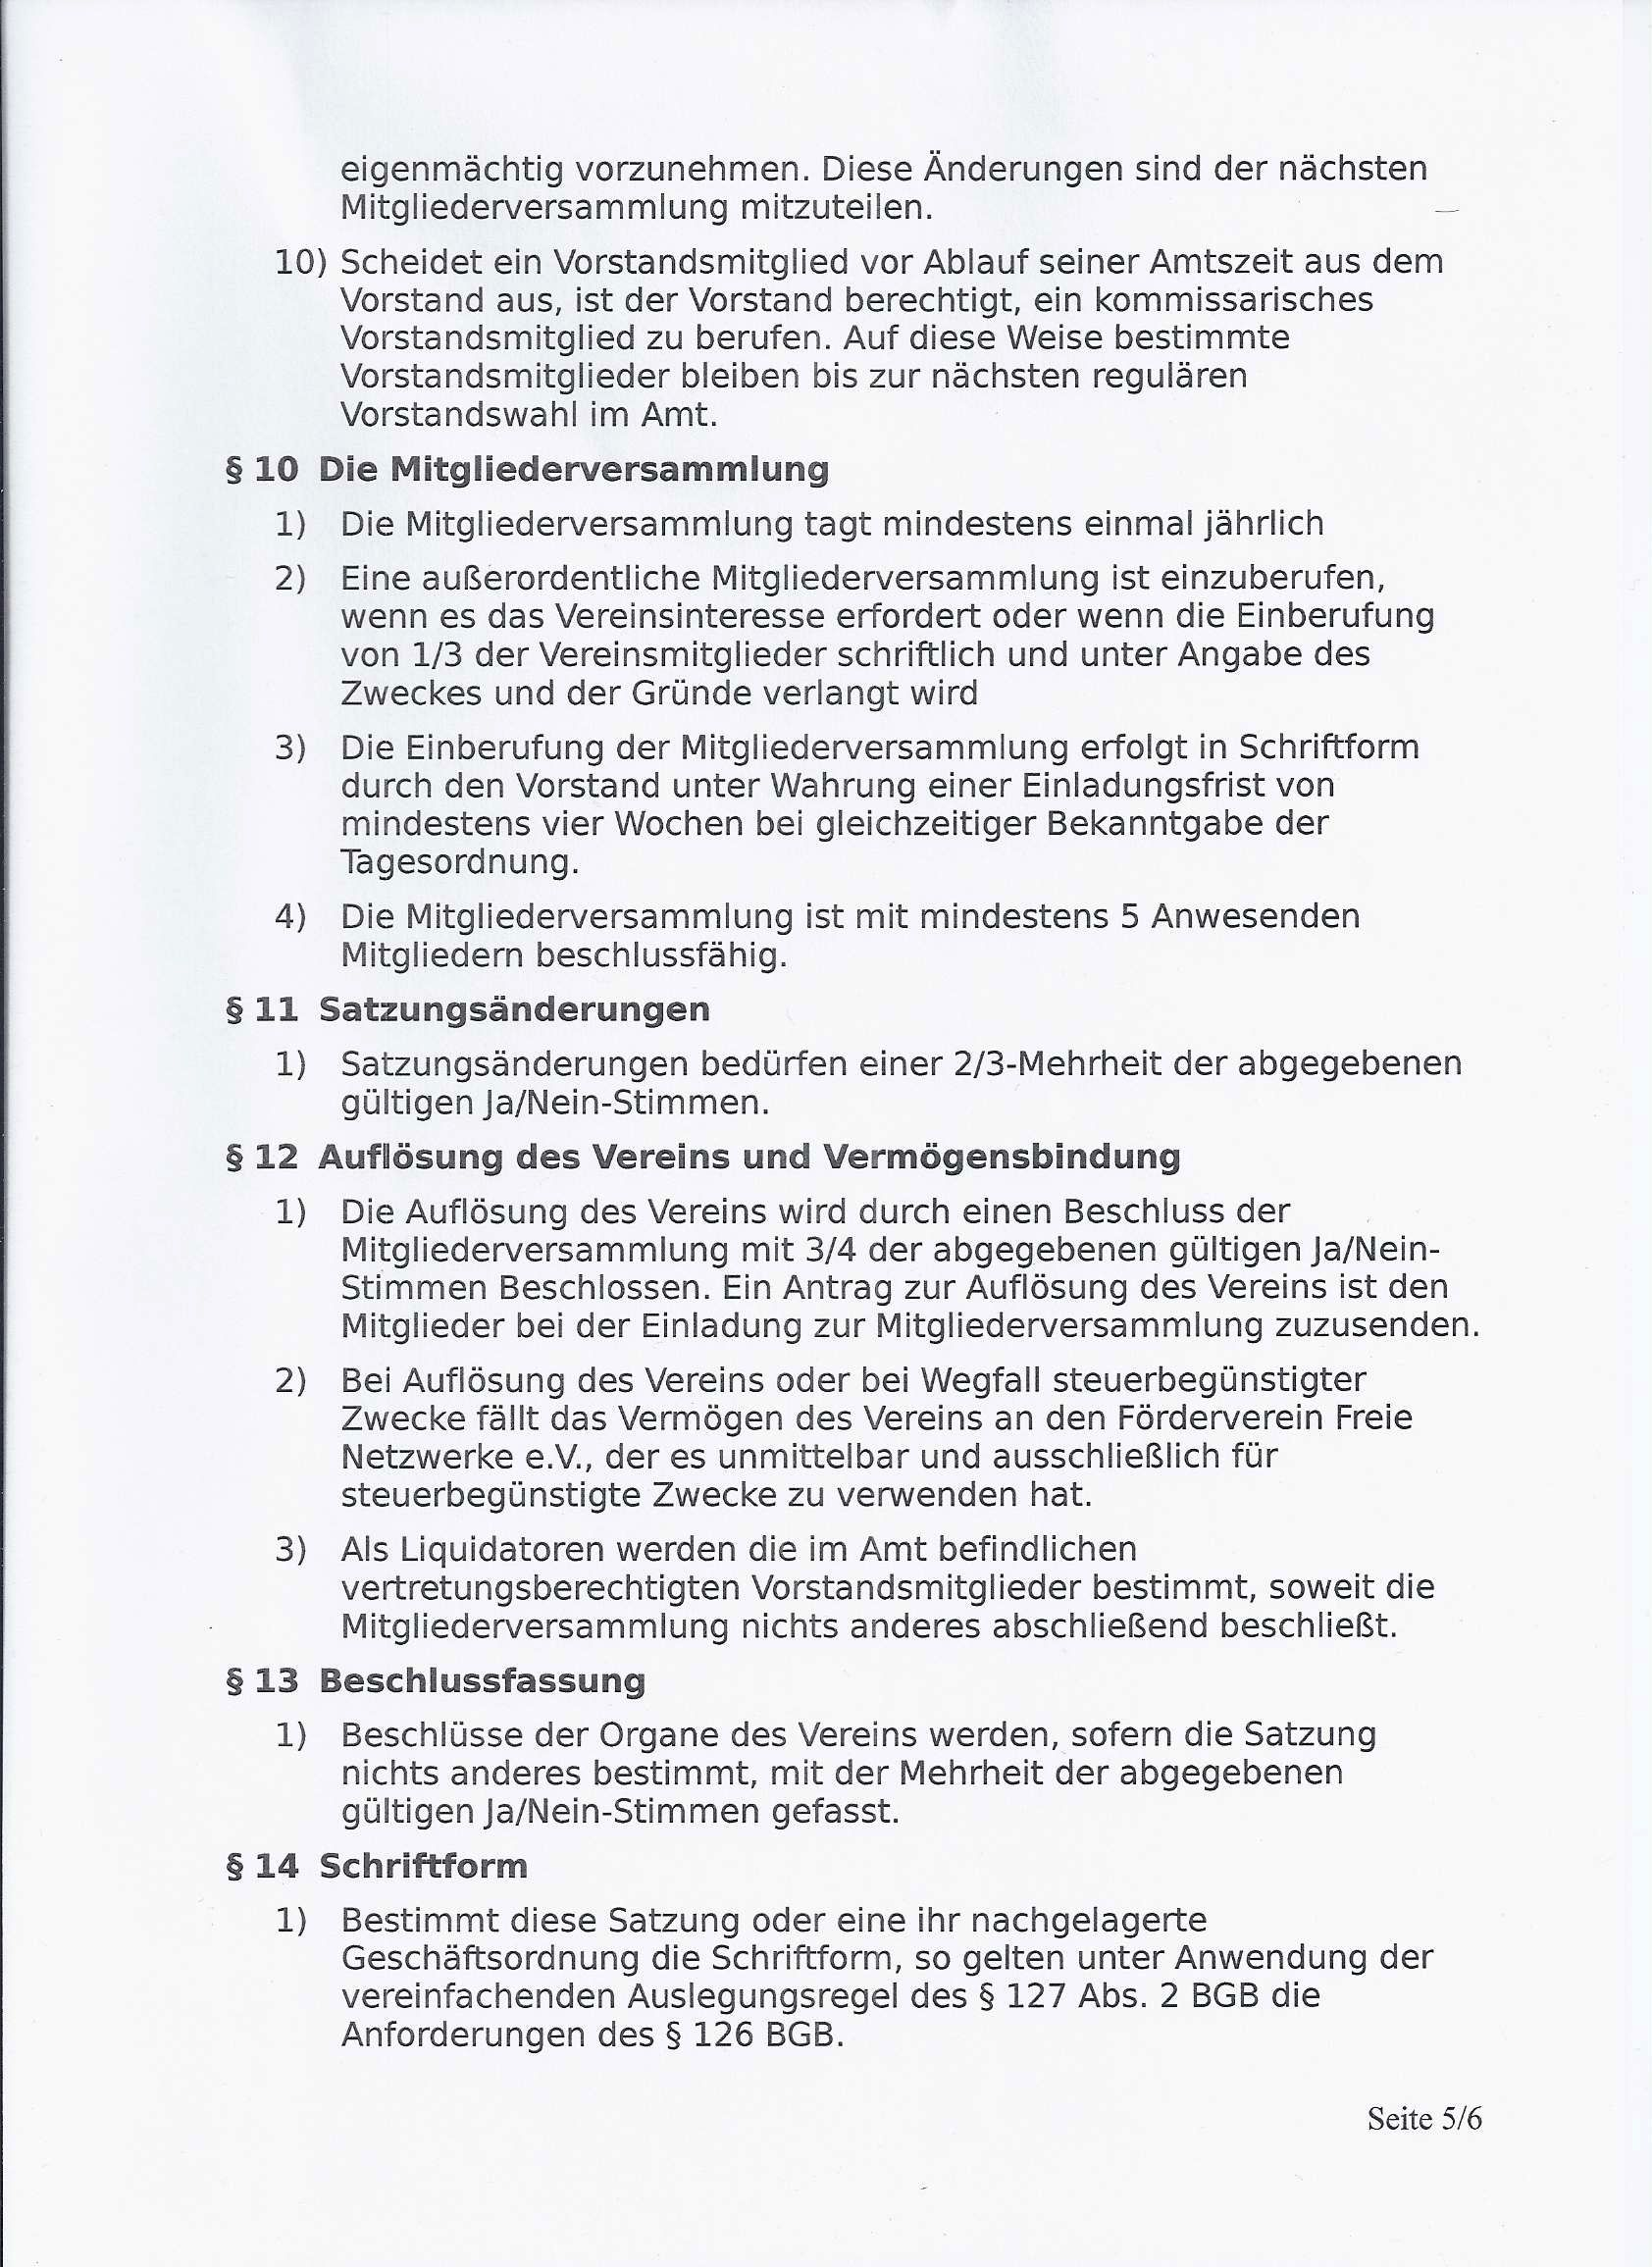 Satzung/Gründungssatzung/verein_freifunk_oldenburg_satzung_0005.jpg